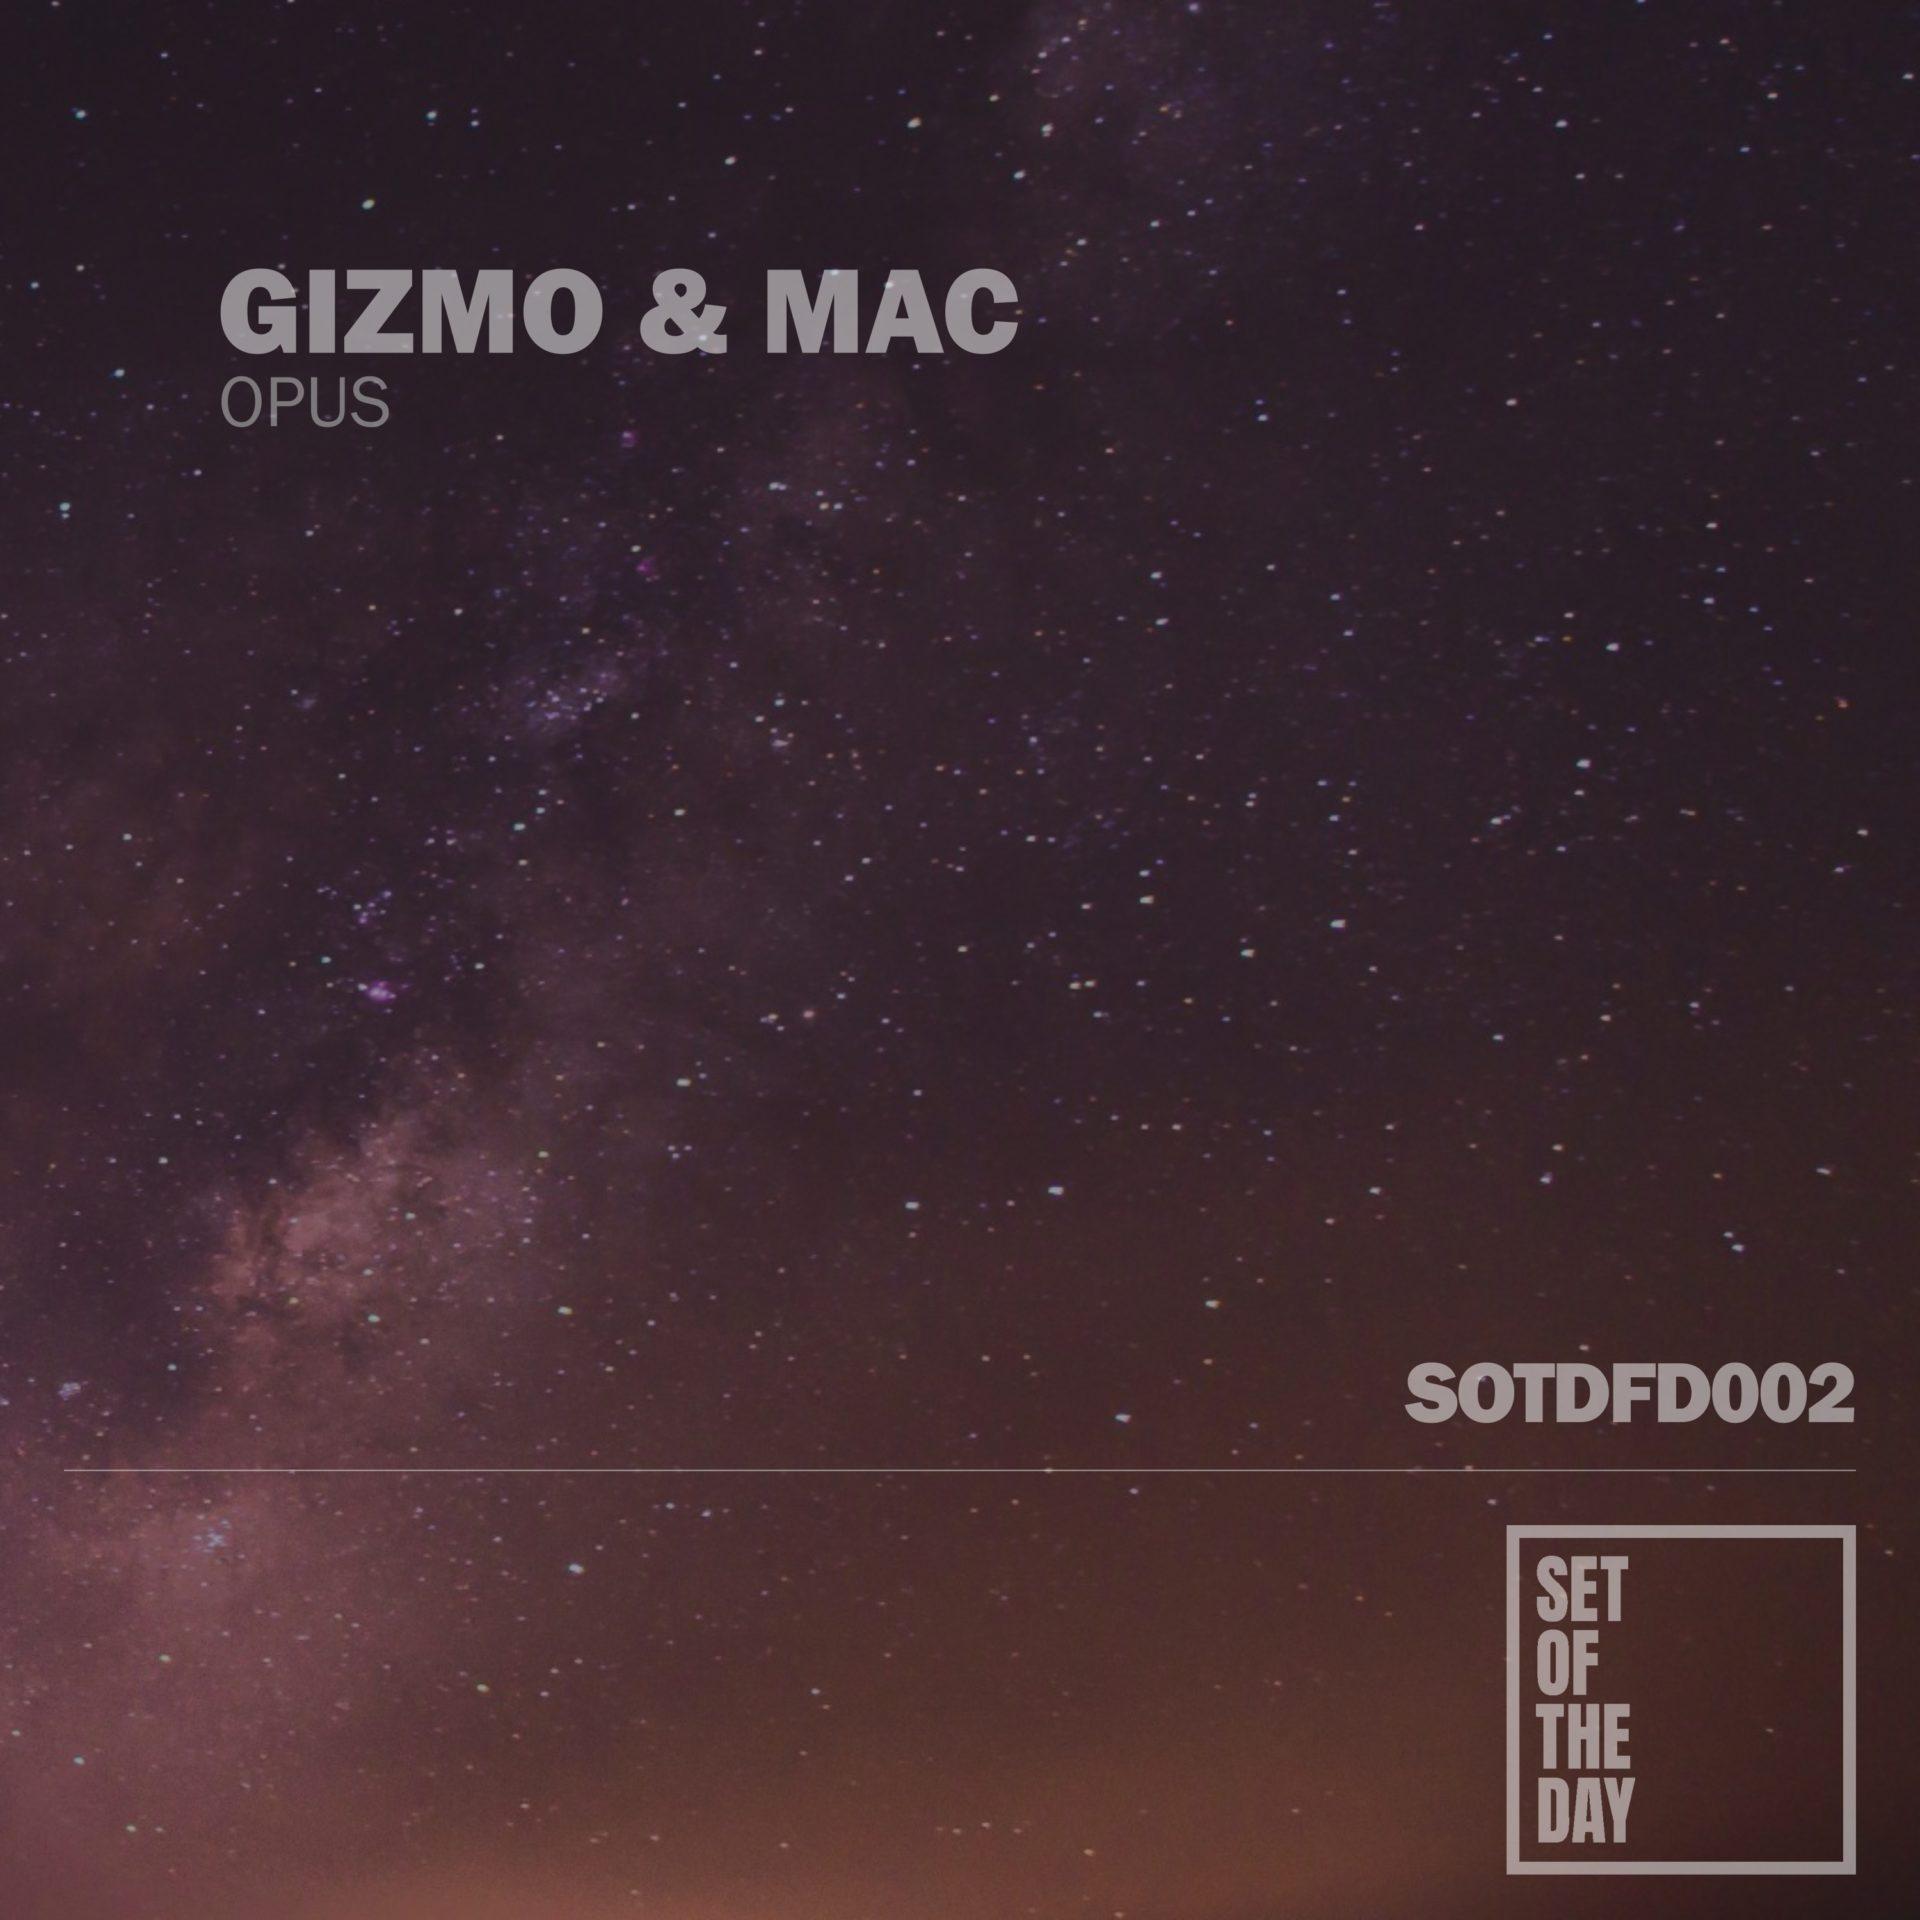 sotdfd002-gizmo-mac-opus2-1920x1920 - Releases